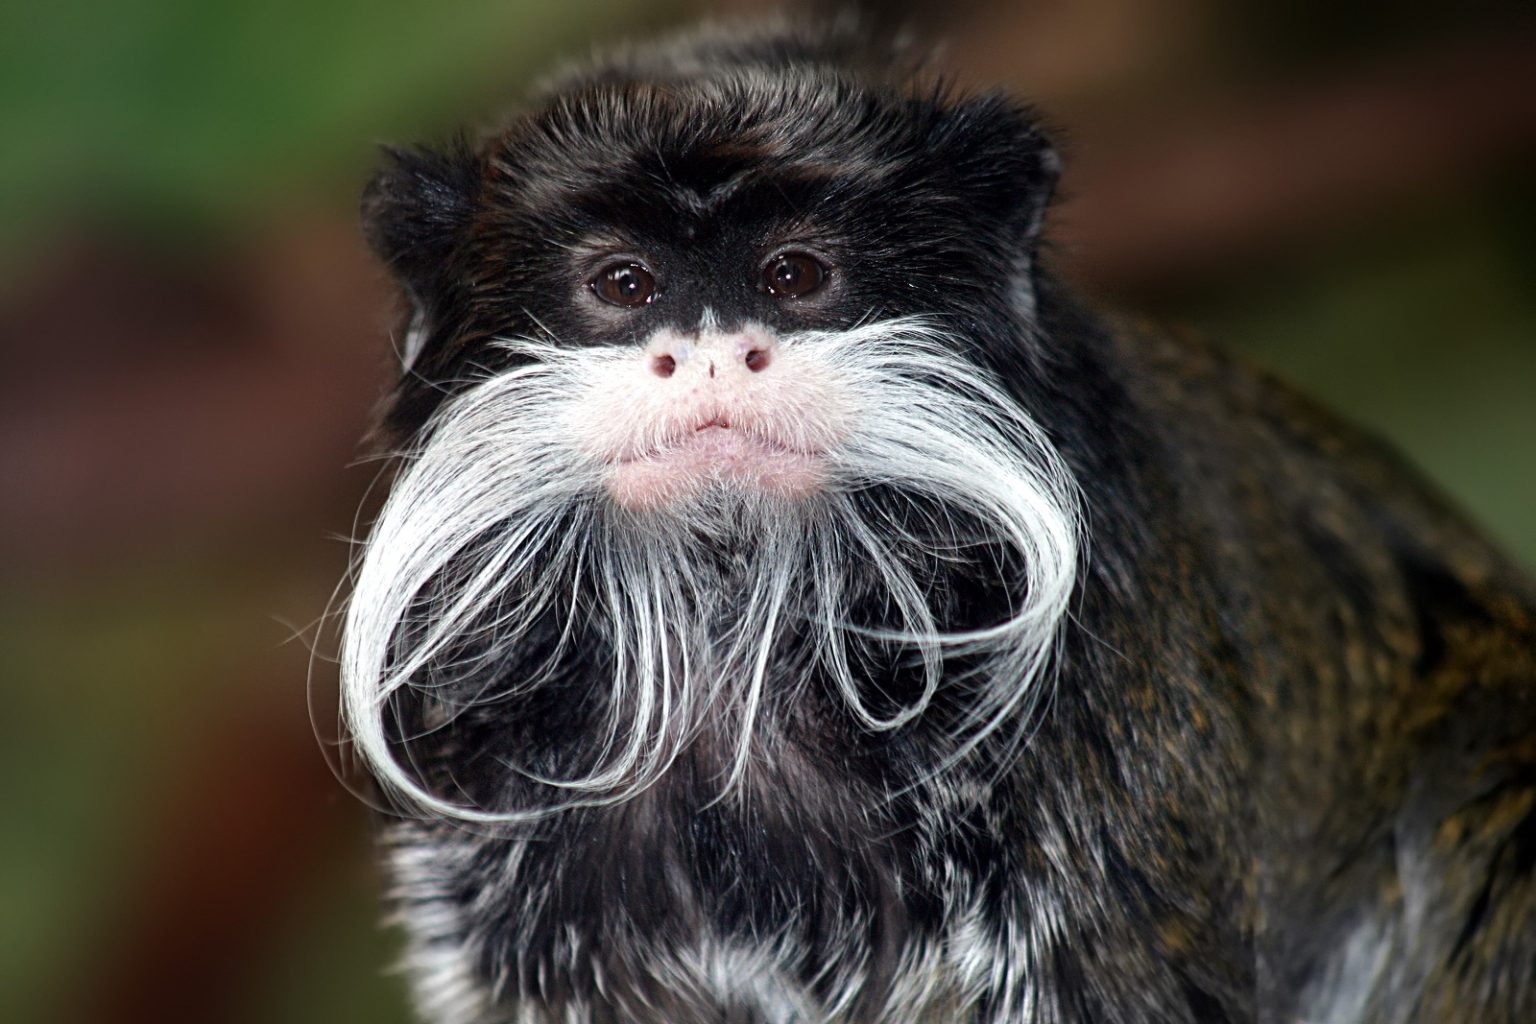 Image: Emperor Tamarin Monkey